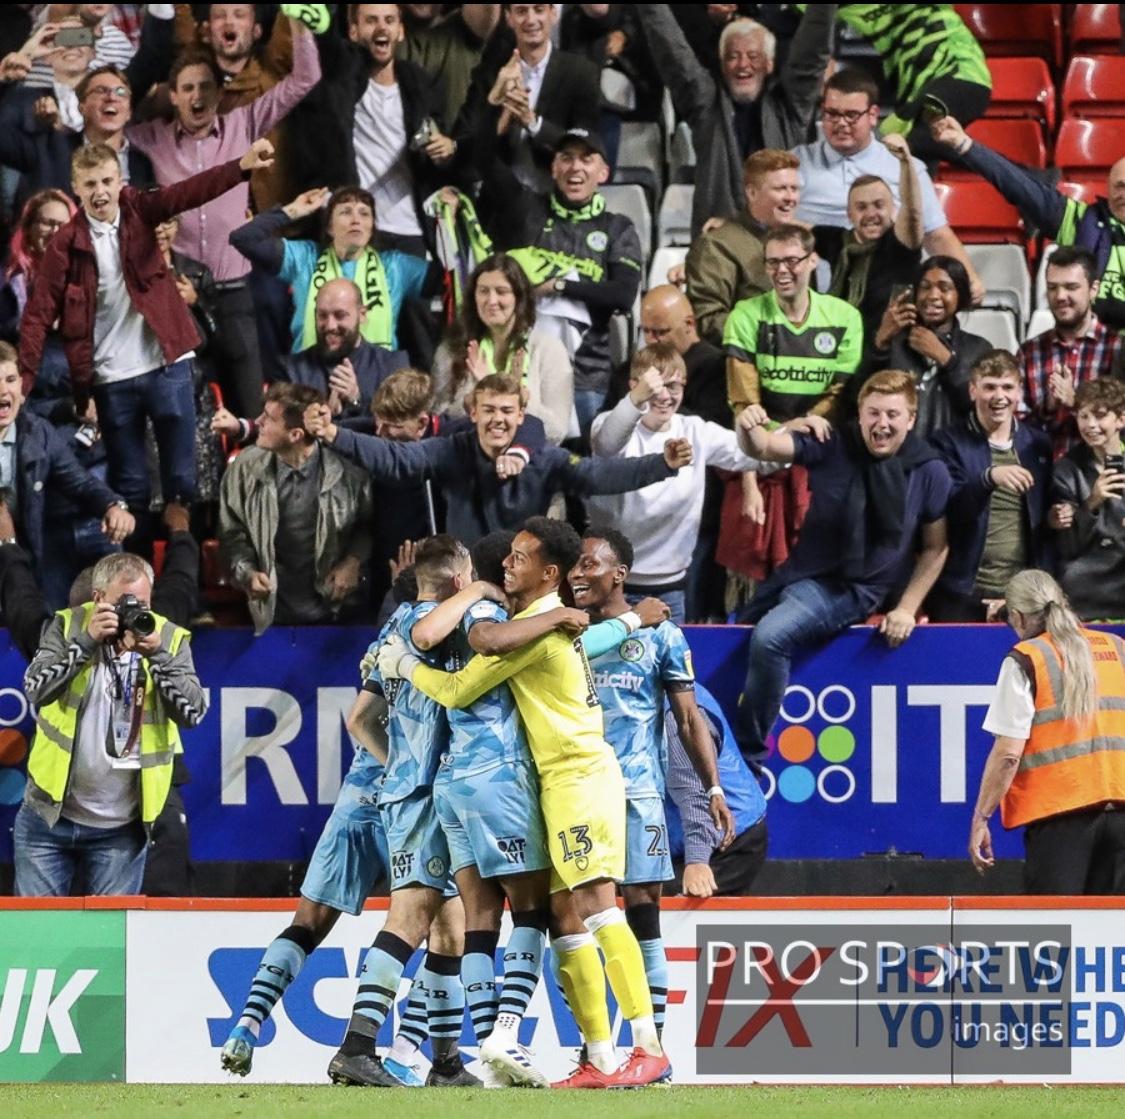 Celebrating The Winning Goal At Charlton